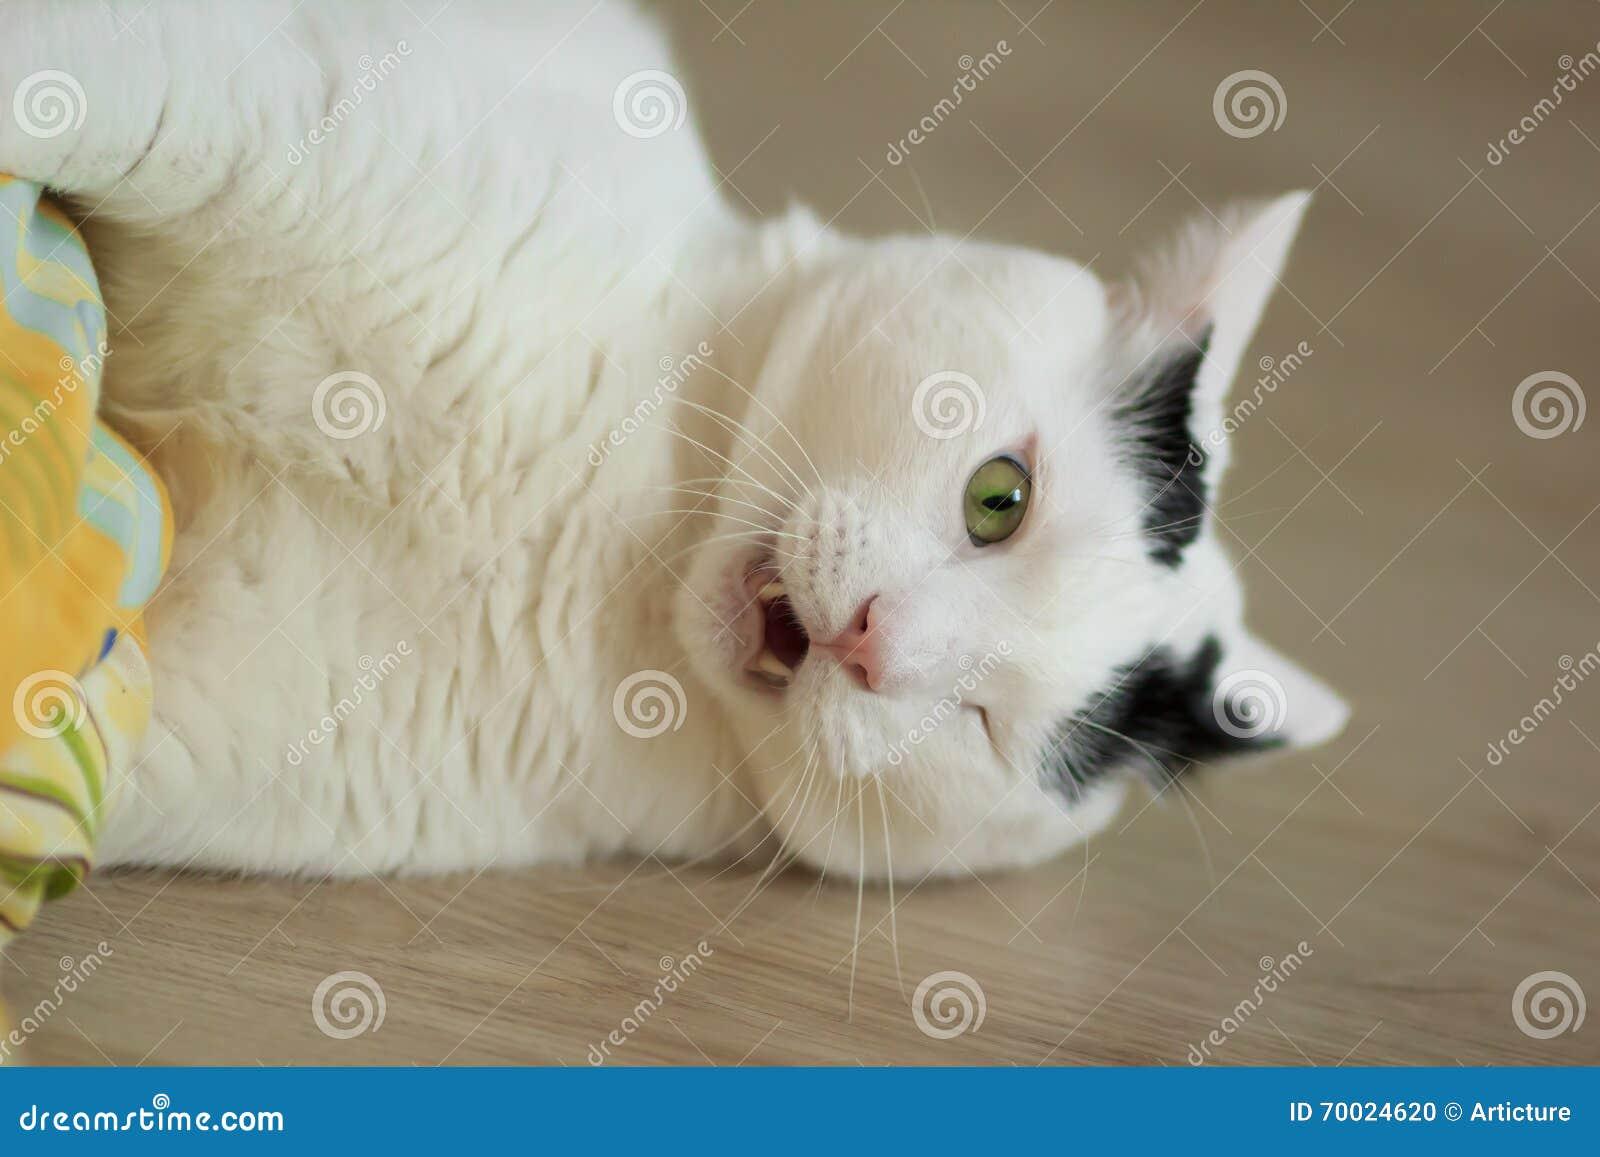 female cat calling sound